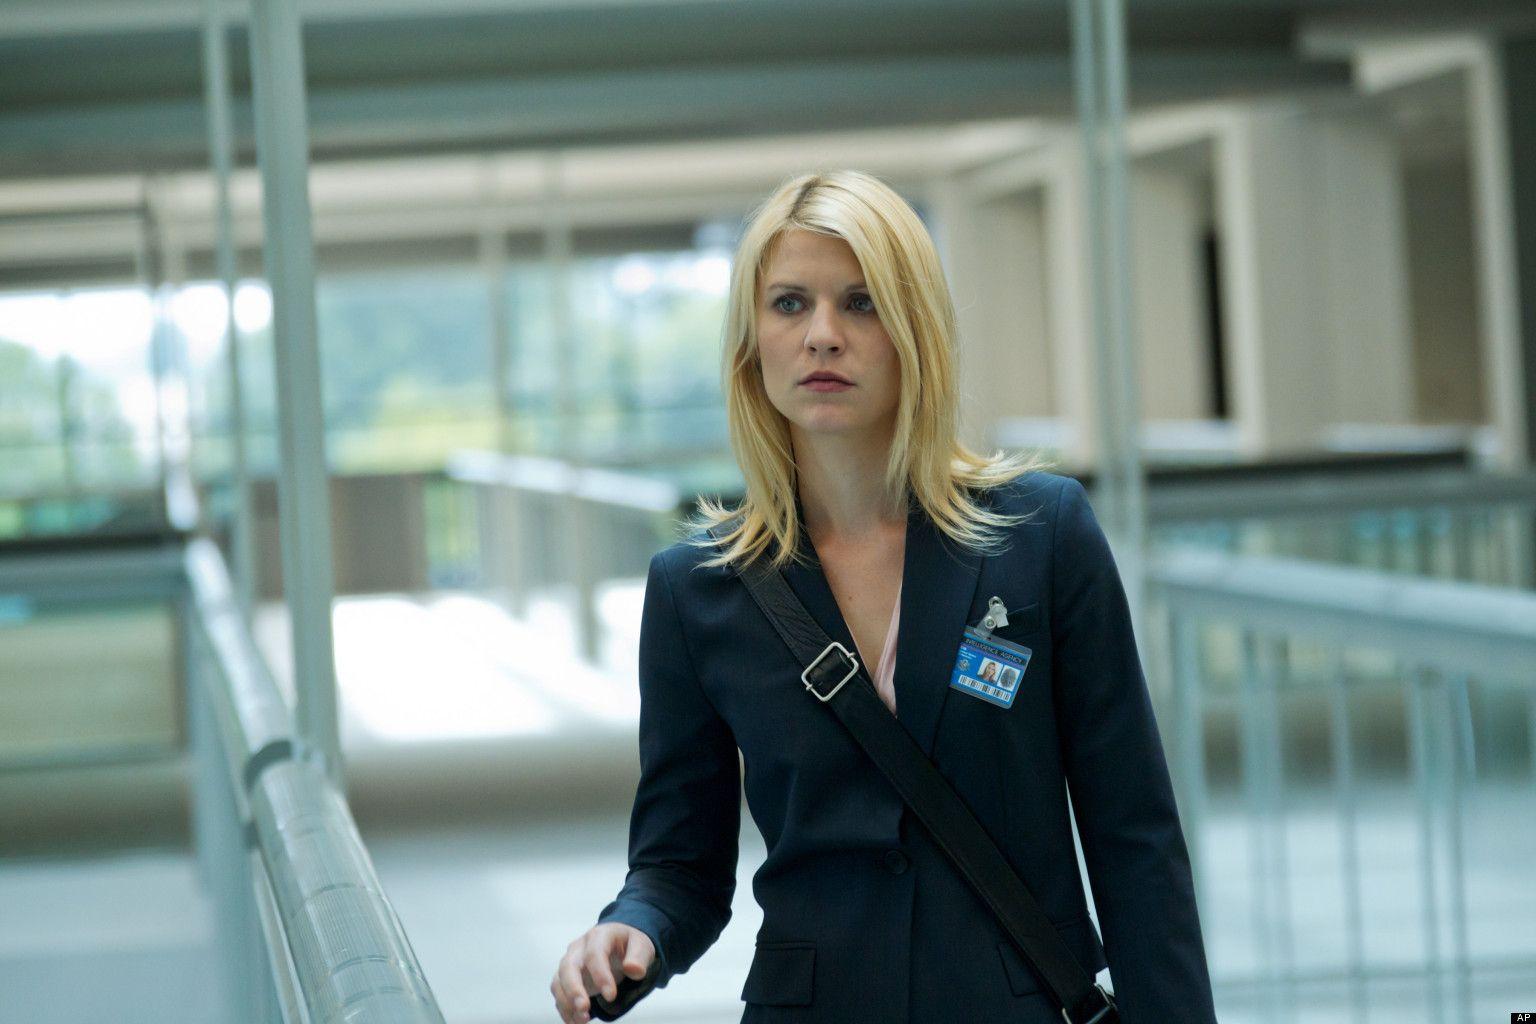 The Carrie Diaries - Season 1 Watch Online in HD - Putlocker